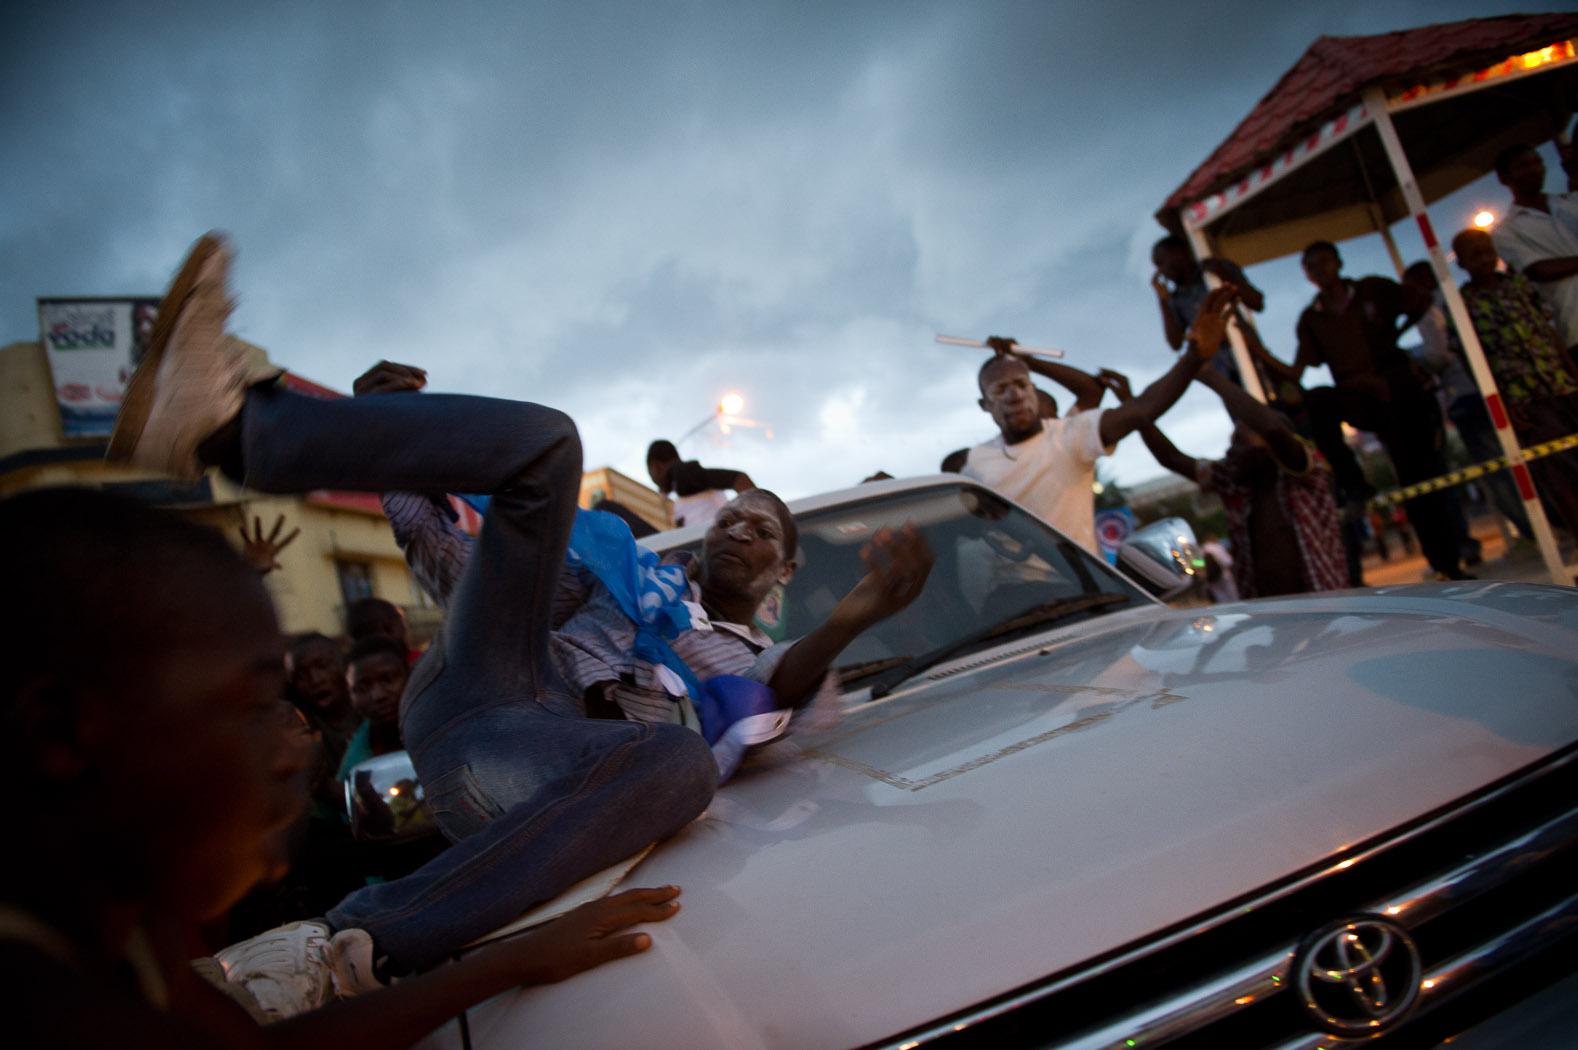 A supporter of incumbent President Joseph Kabila rolls over a car as he celebrates Mr. Kabila's win.